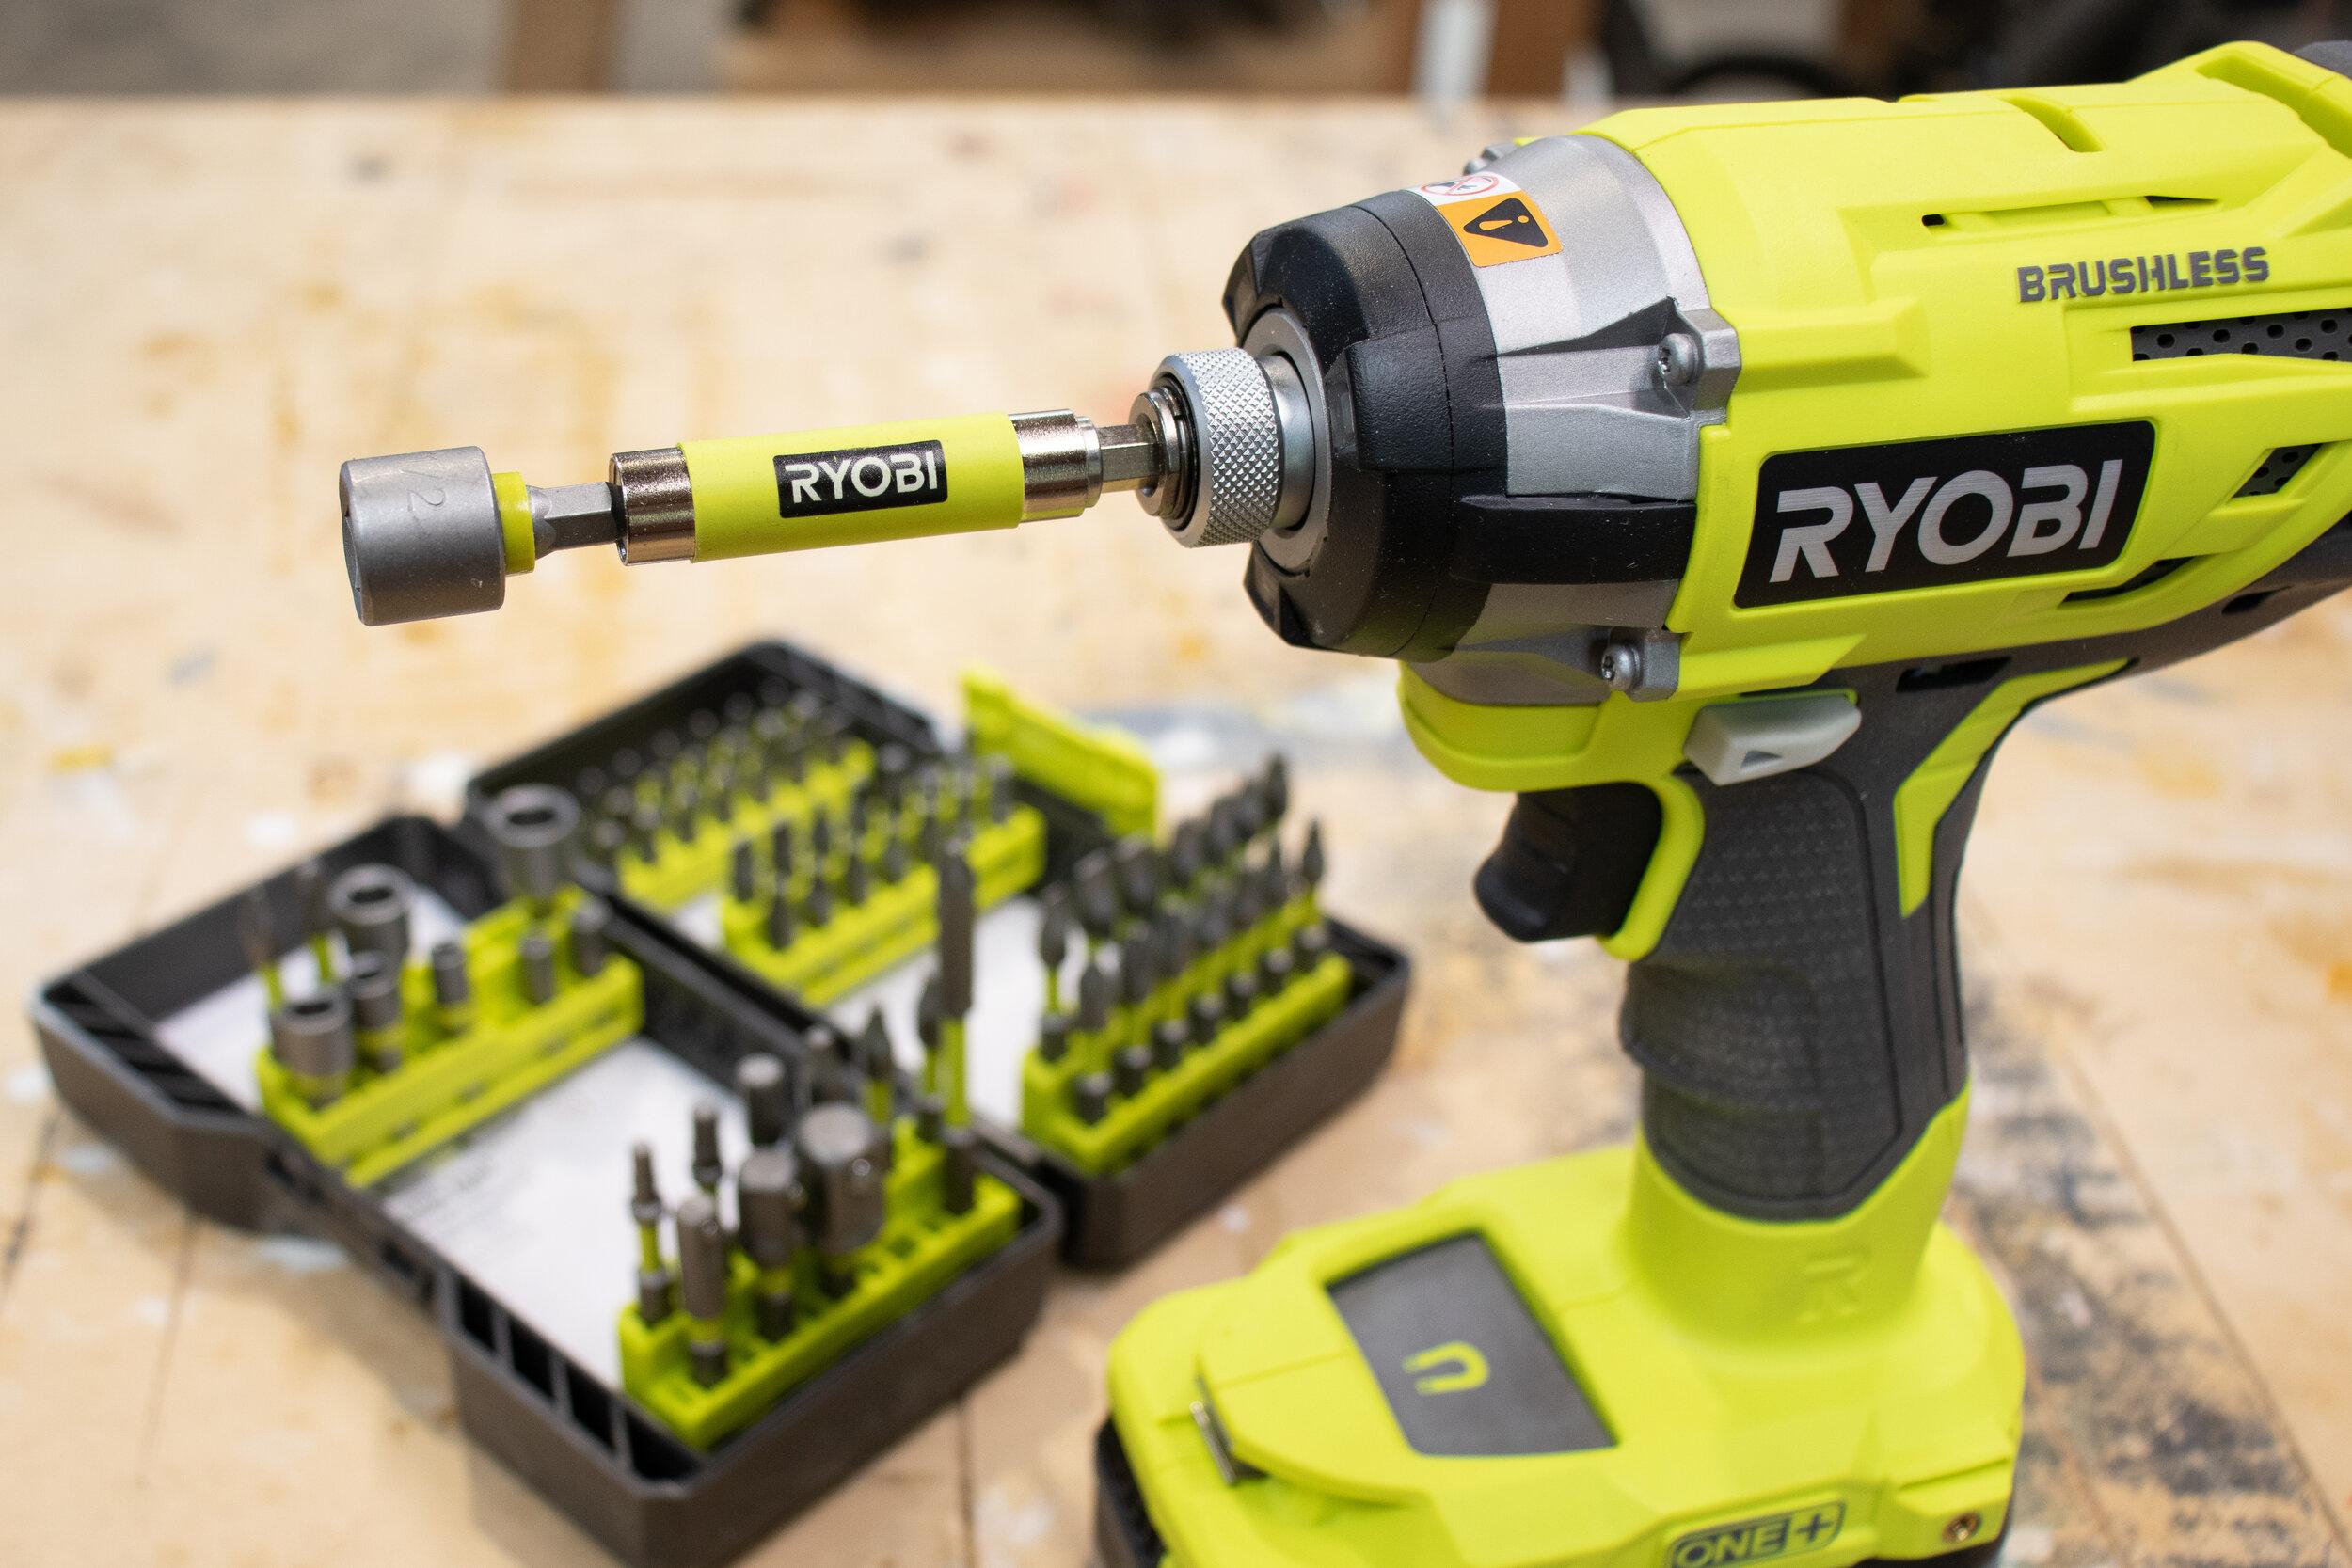 Ryobi Impact Wrench